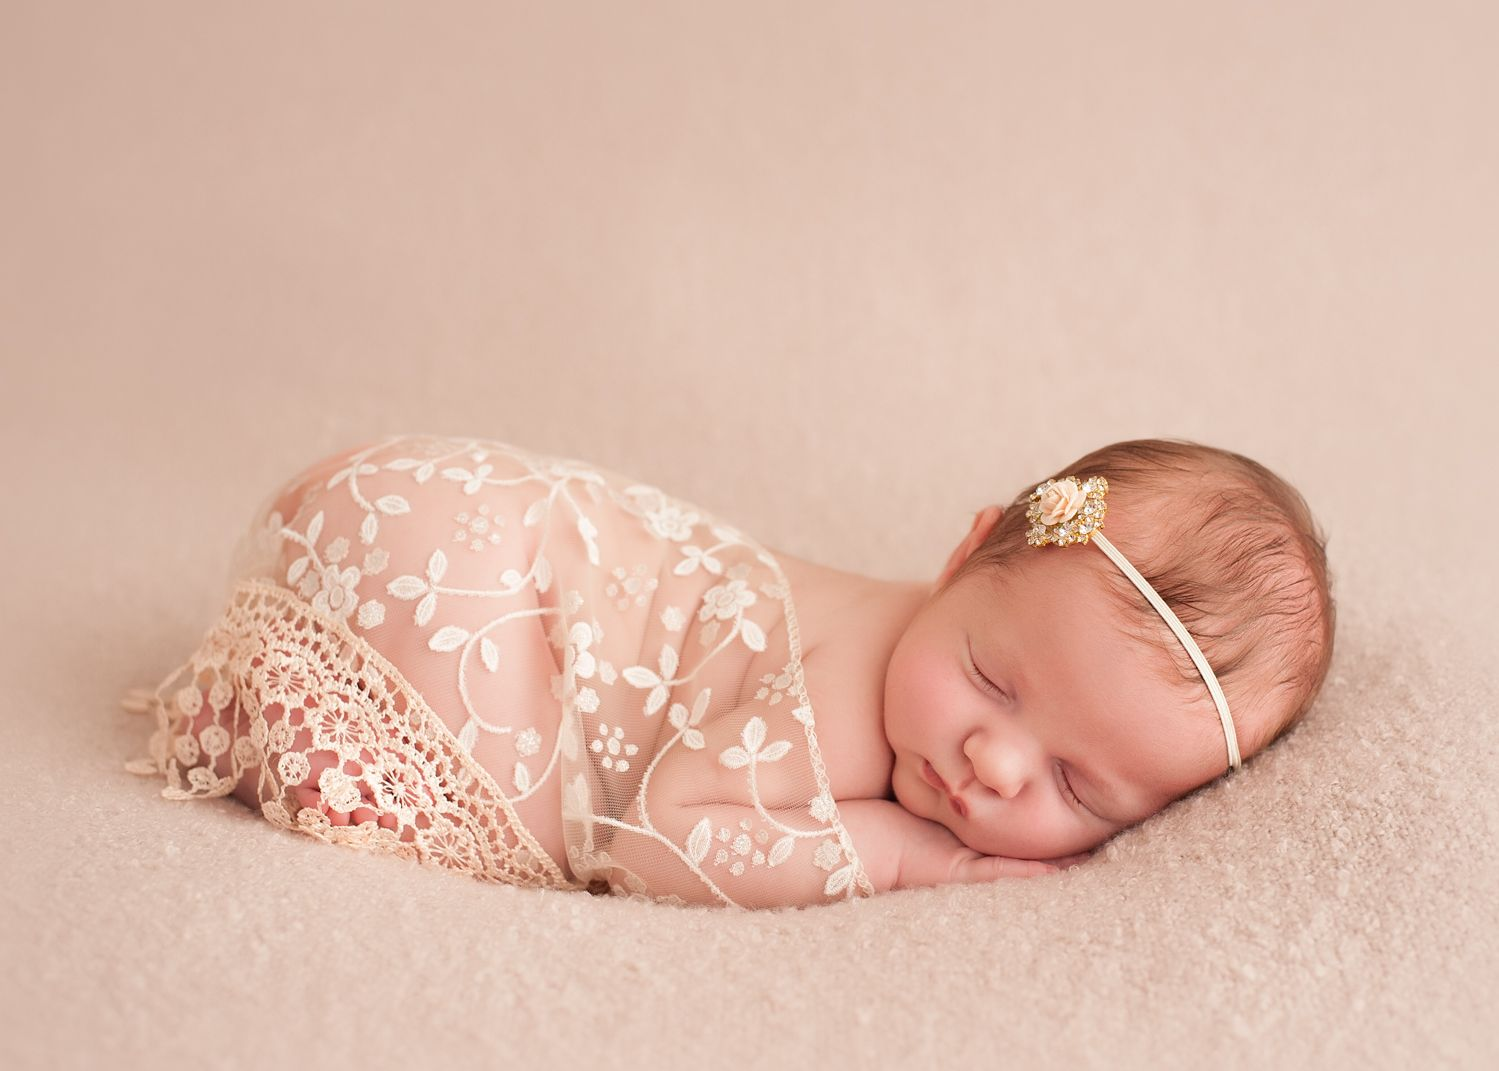 Birth Session - Birth Photographer Gold Coast - Gold Coast Born photography gold coast